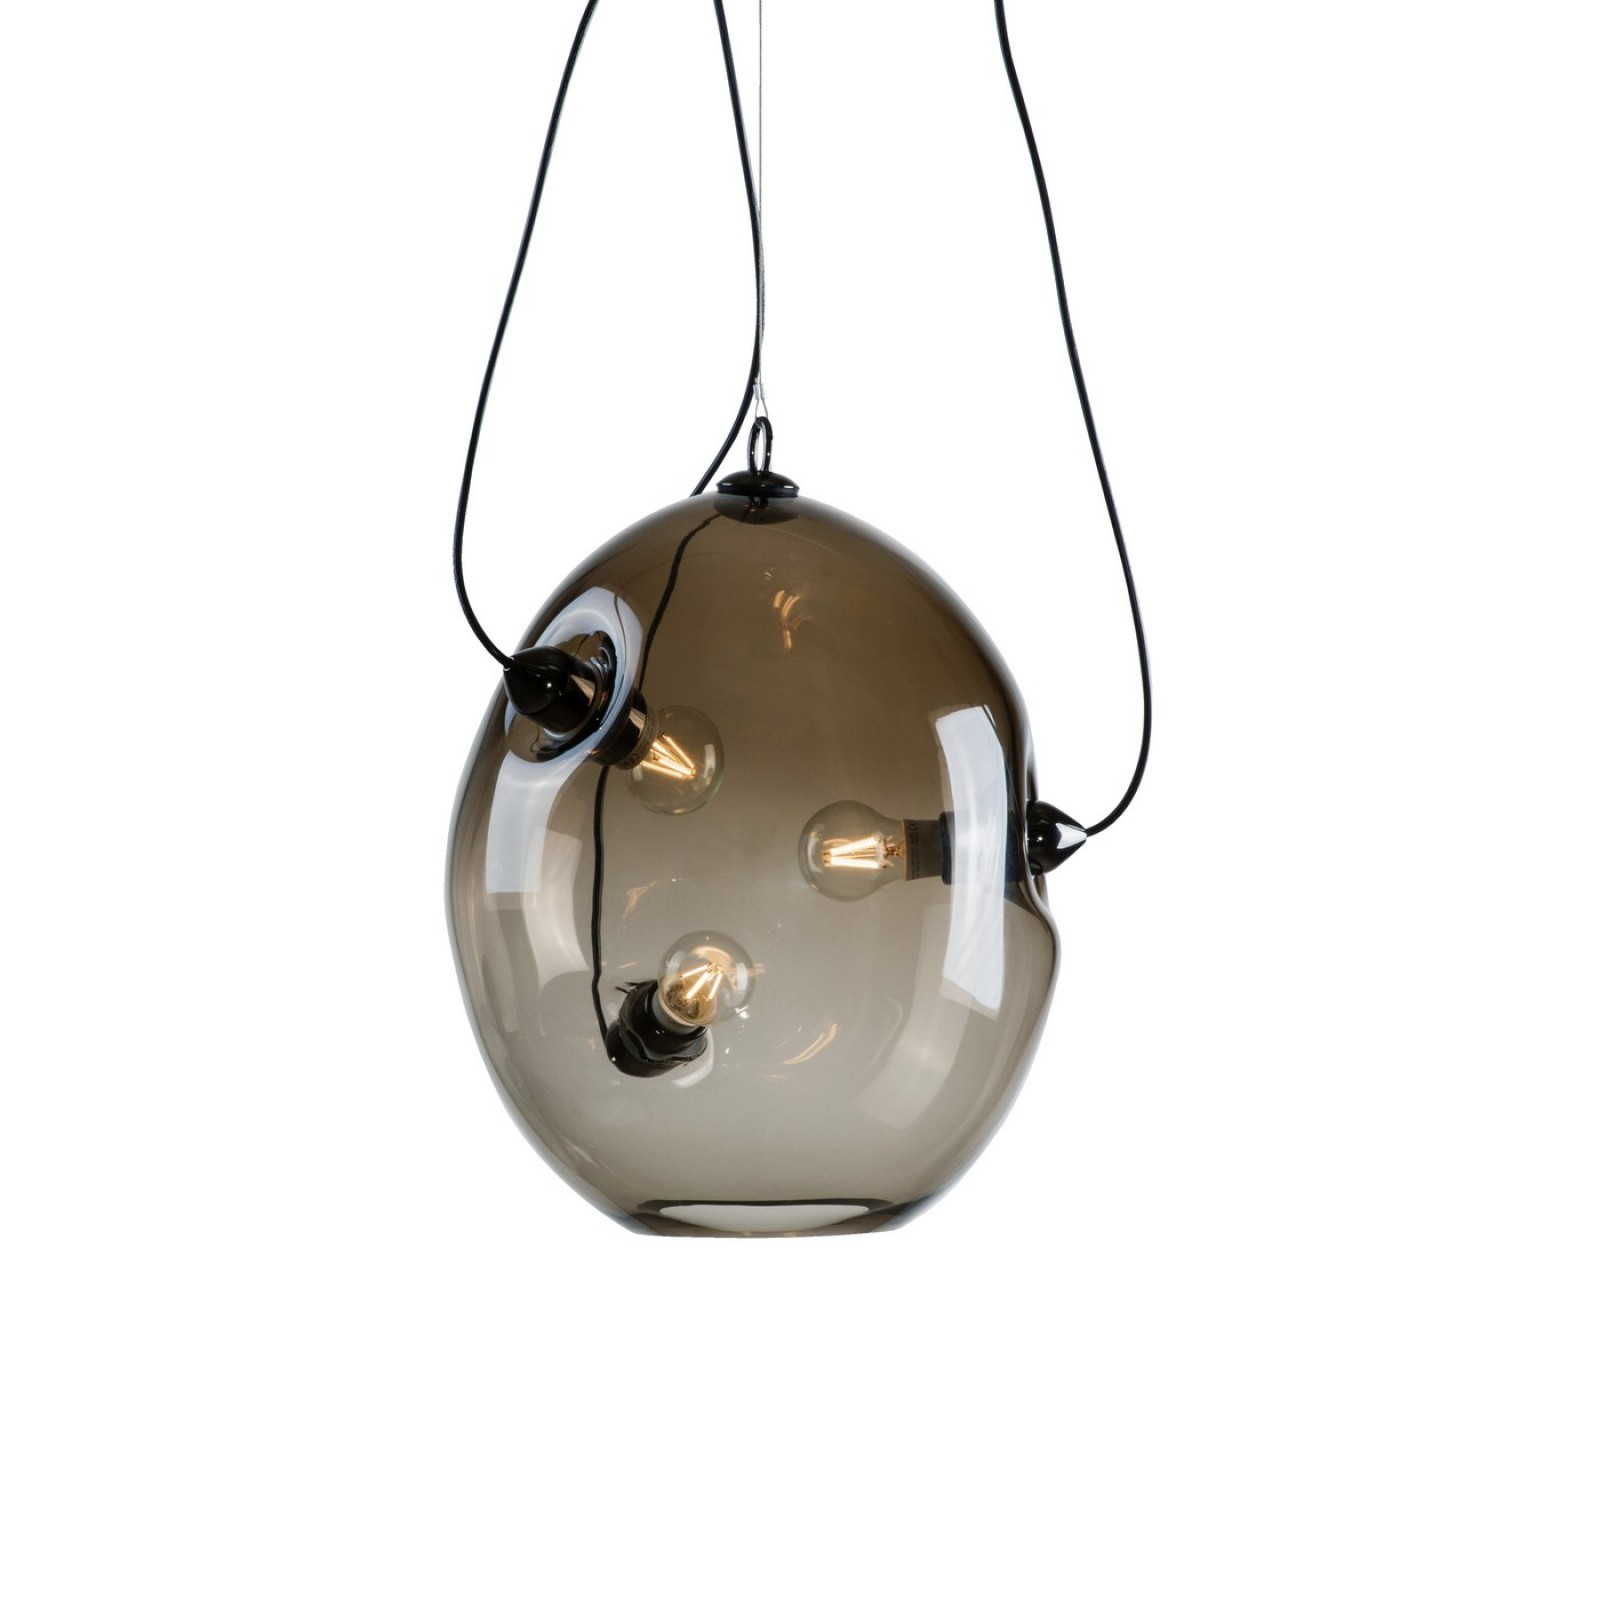 Membrane Pendant Lamp - Innermost